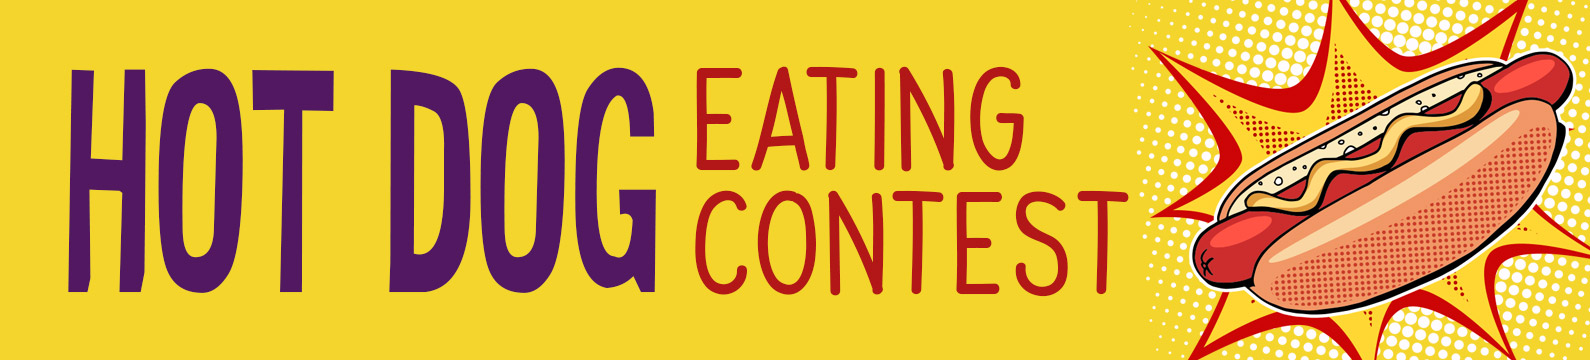 https://www.ripleys.com/baltimore/hot-dog-eating-contest/?sid=web-sldr-hotdog-0518